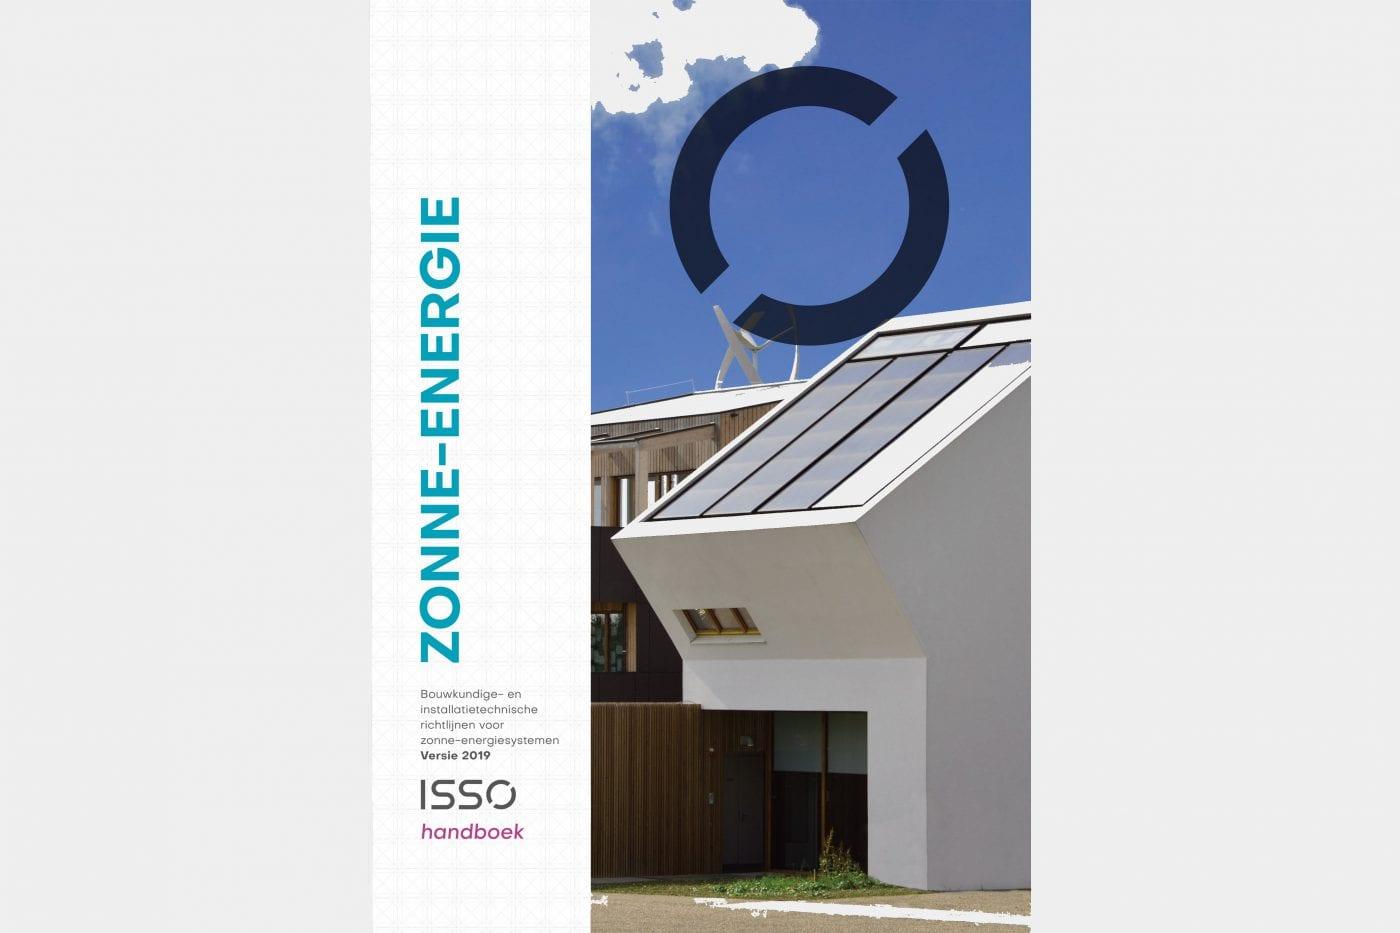 handboek zonne-energie, pv-paneel, zonnepanelen